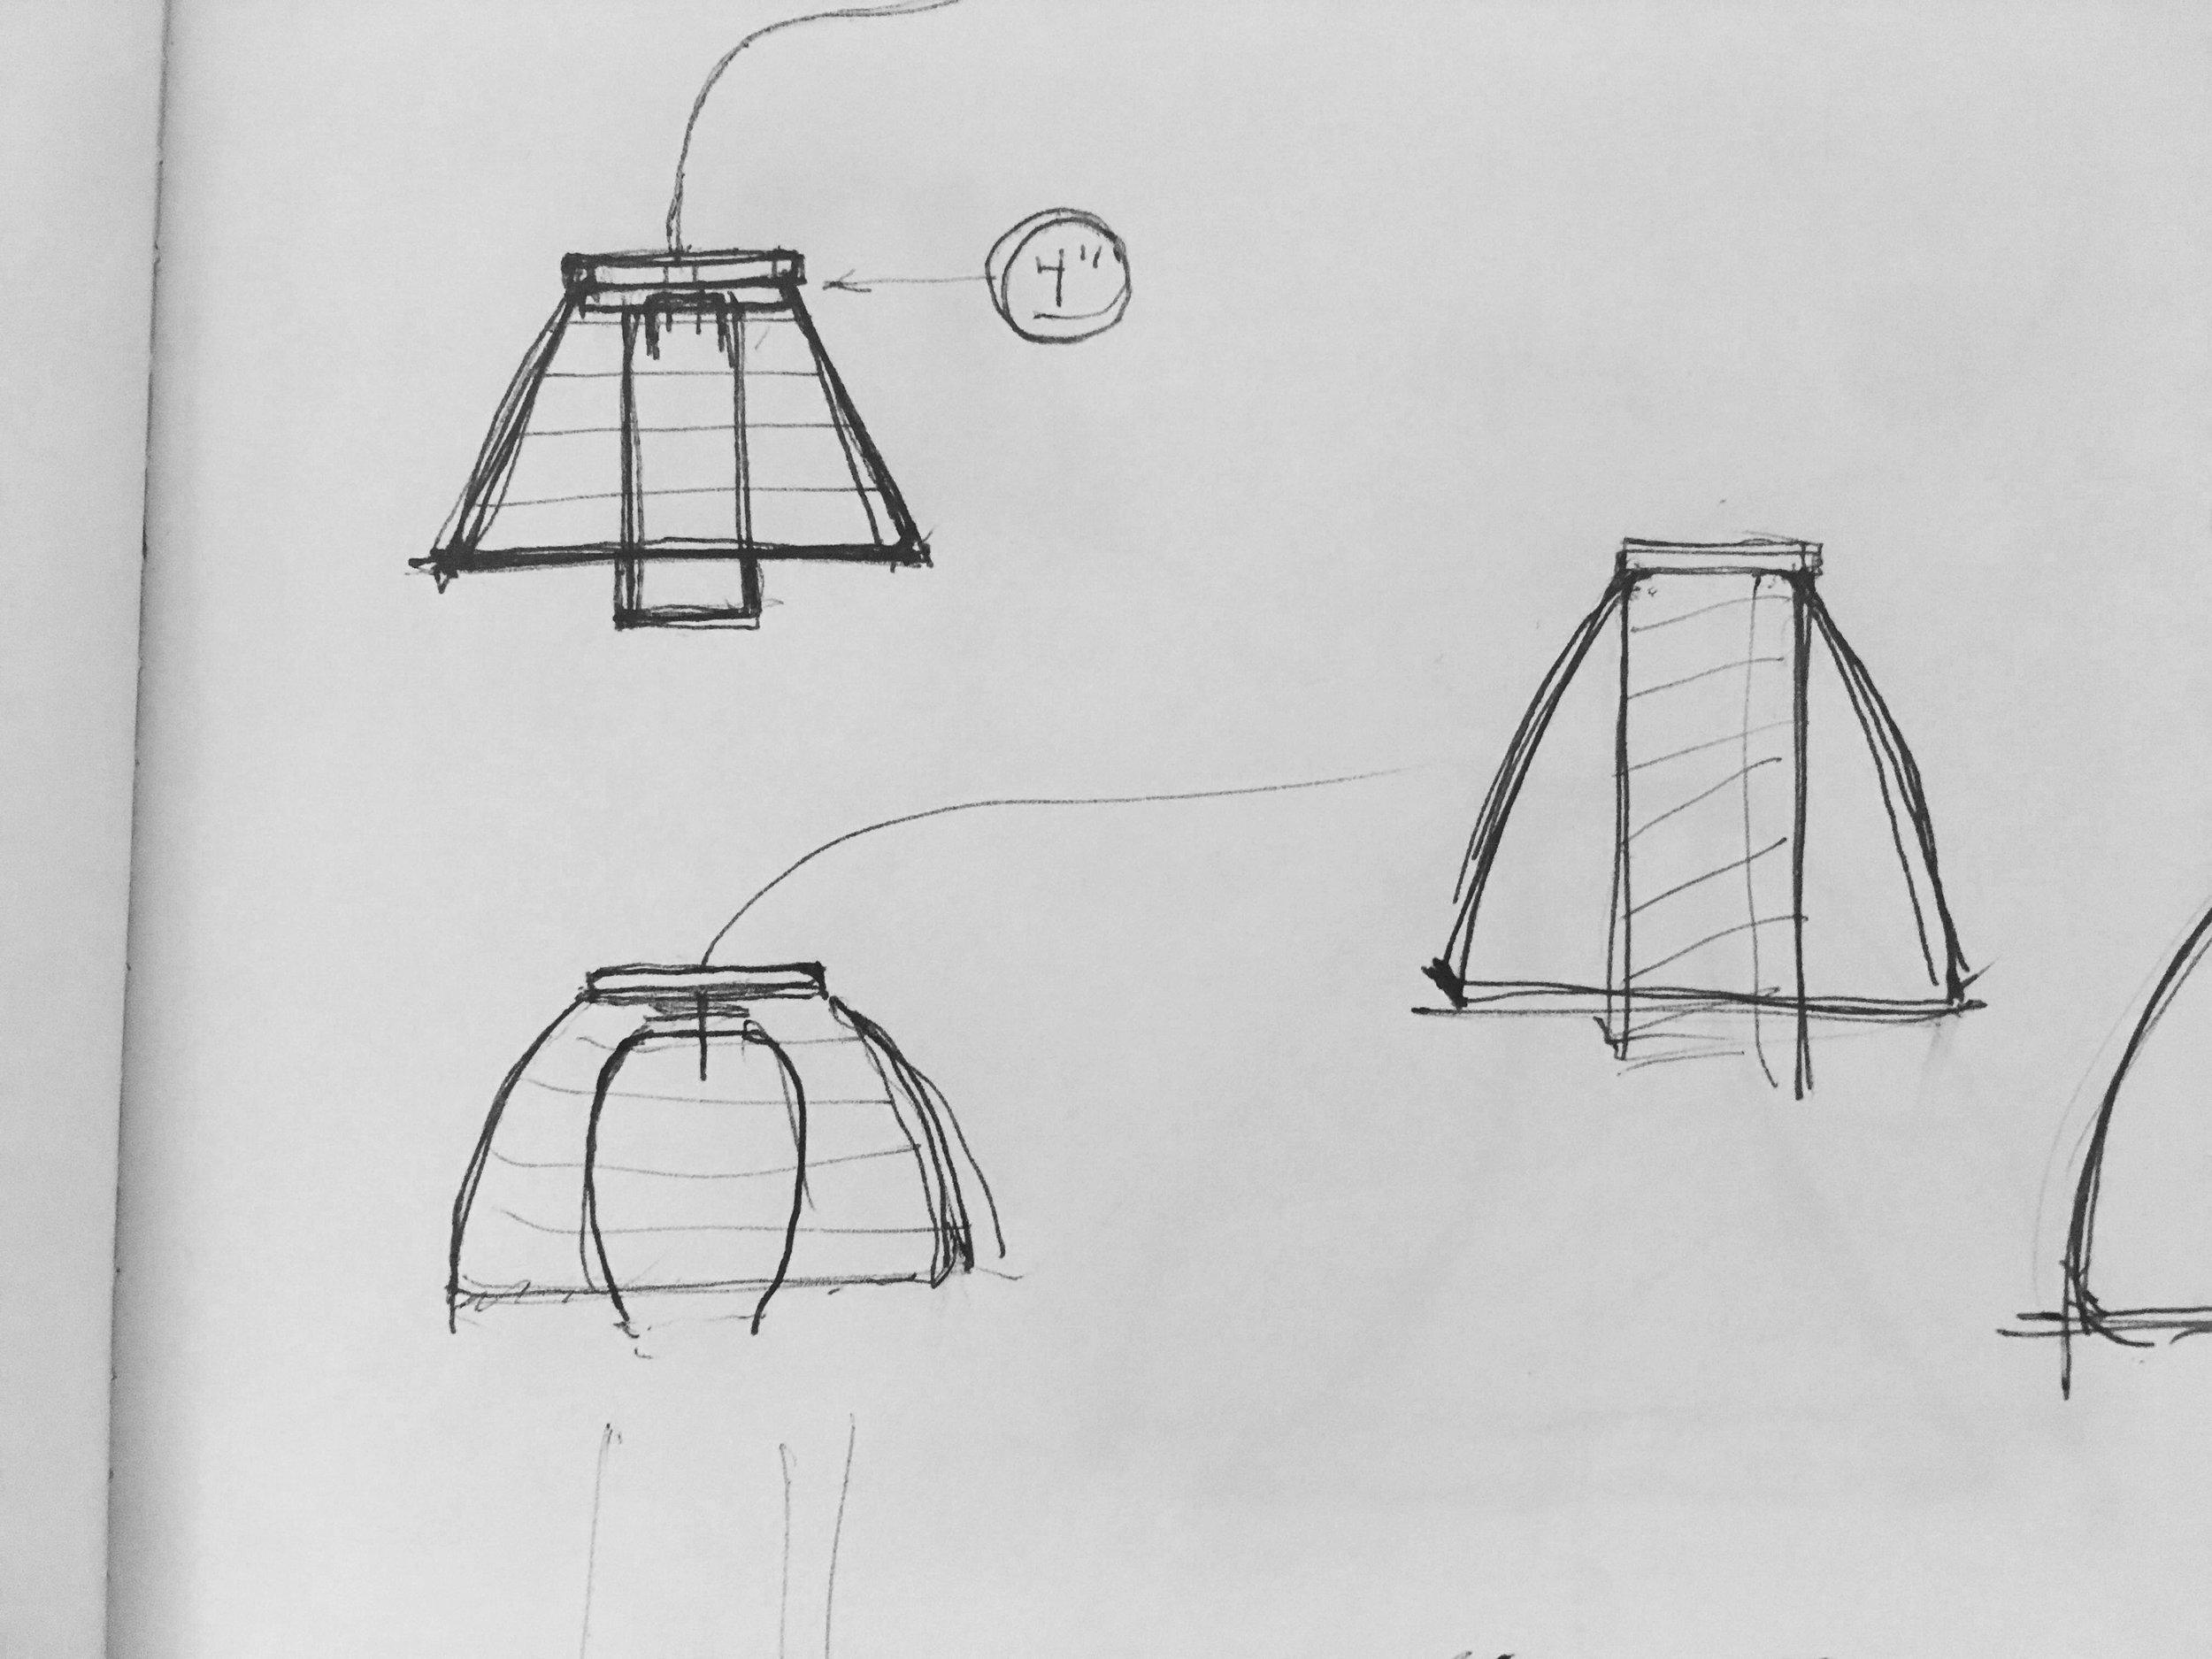 sketch5 copy.jpg